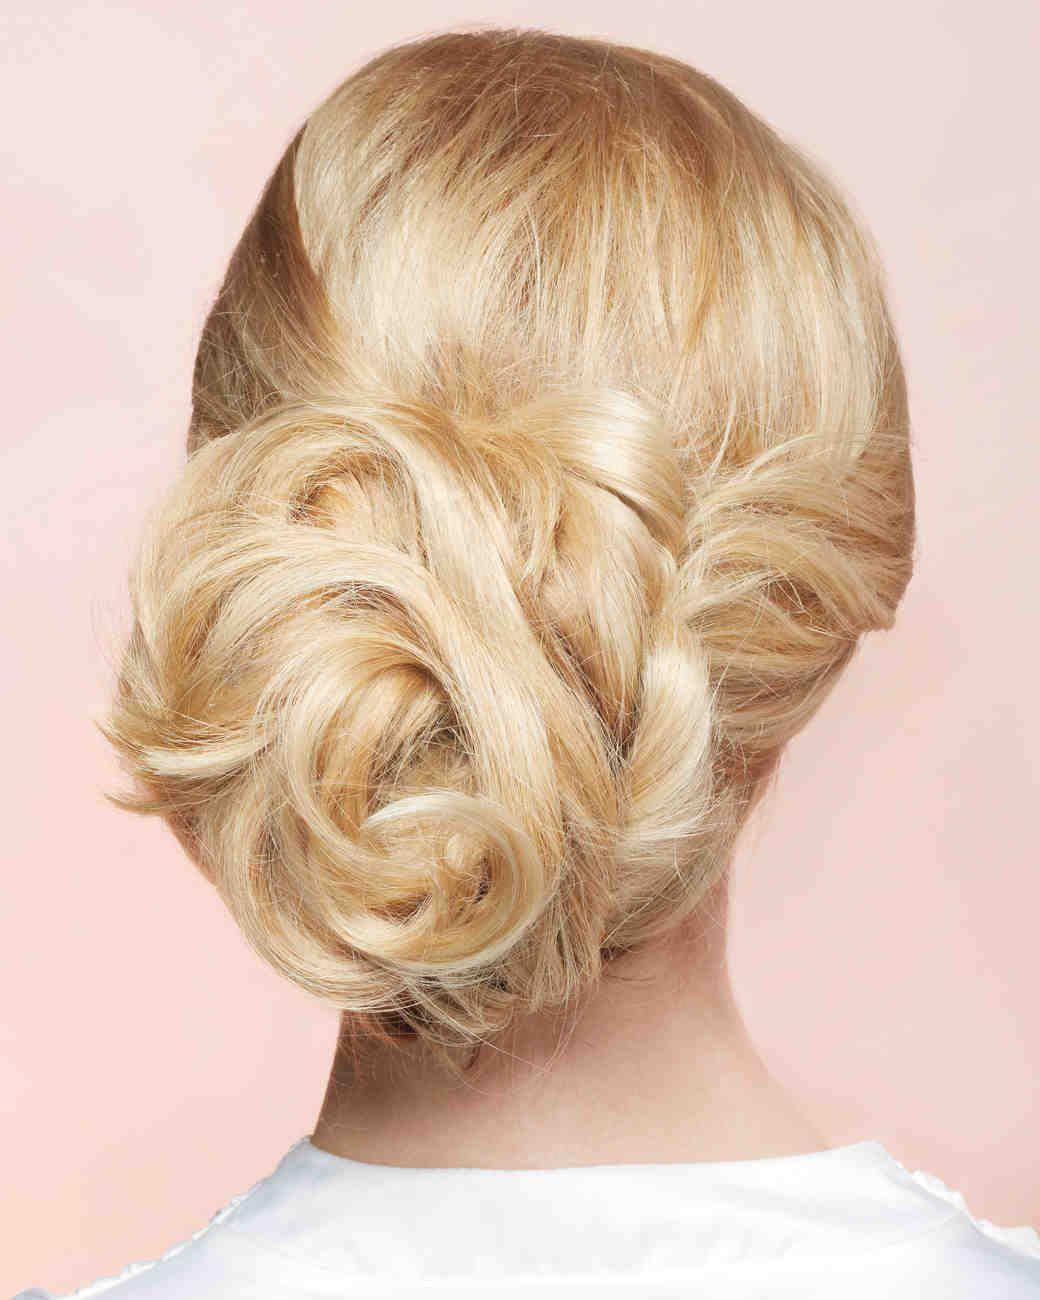 Celebrity Wedding Etiquette: Diy Wedding Hair, Mother Of The